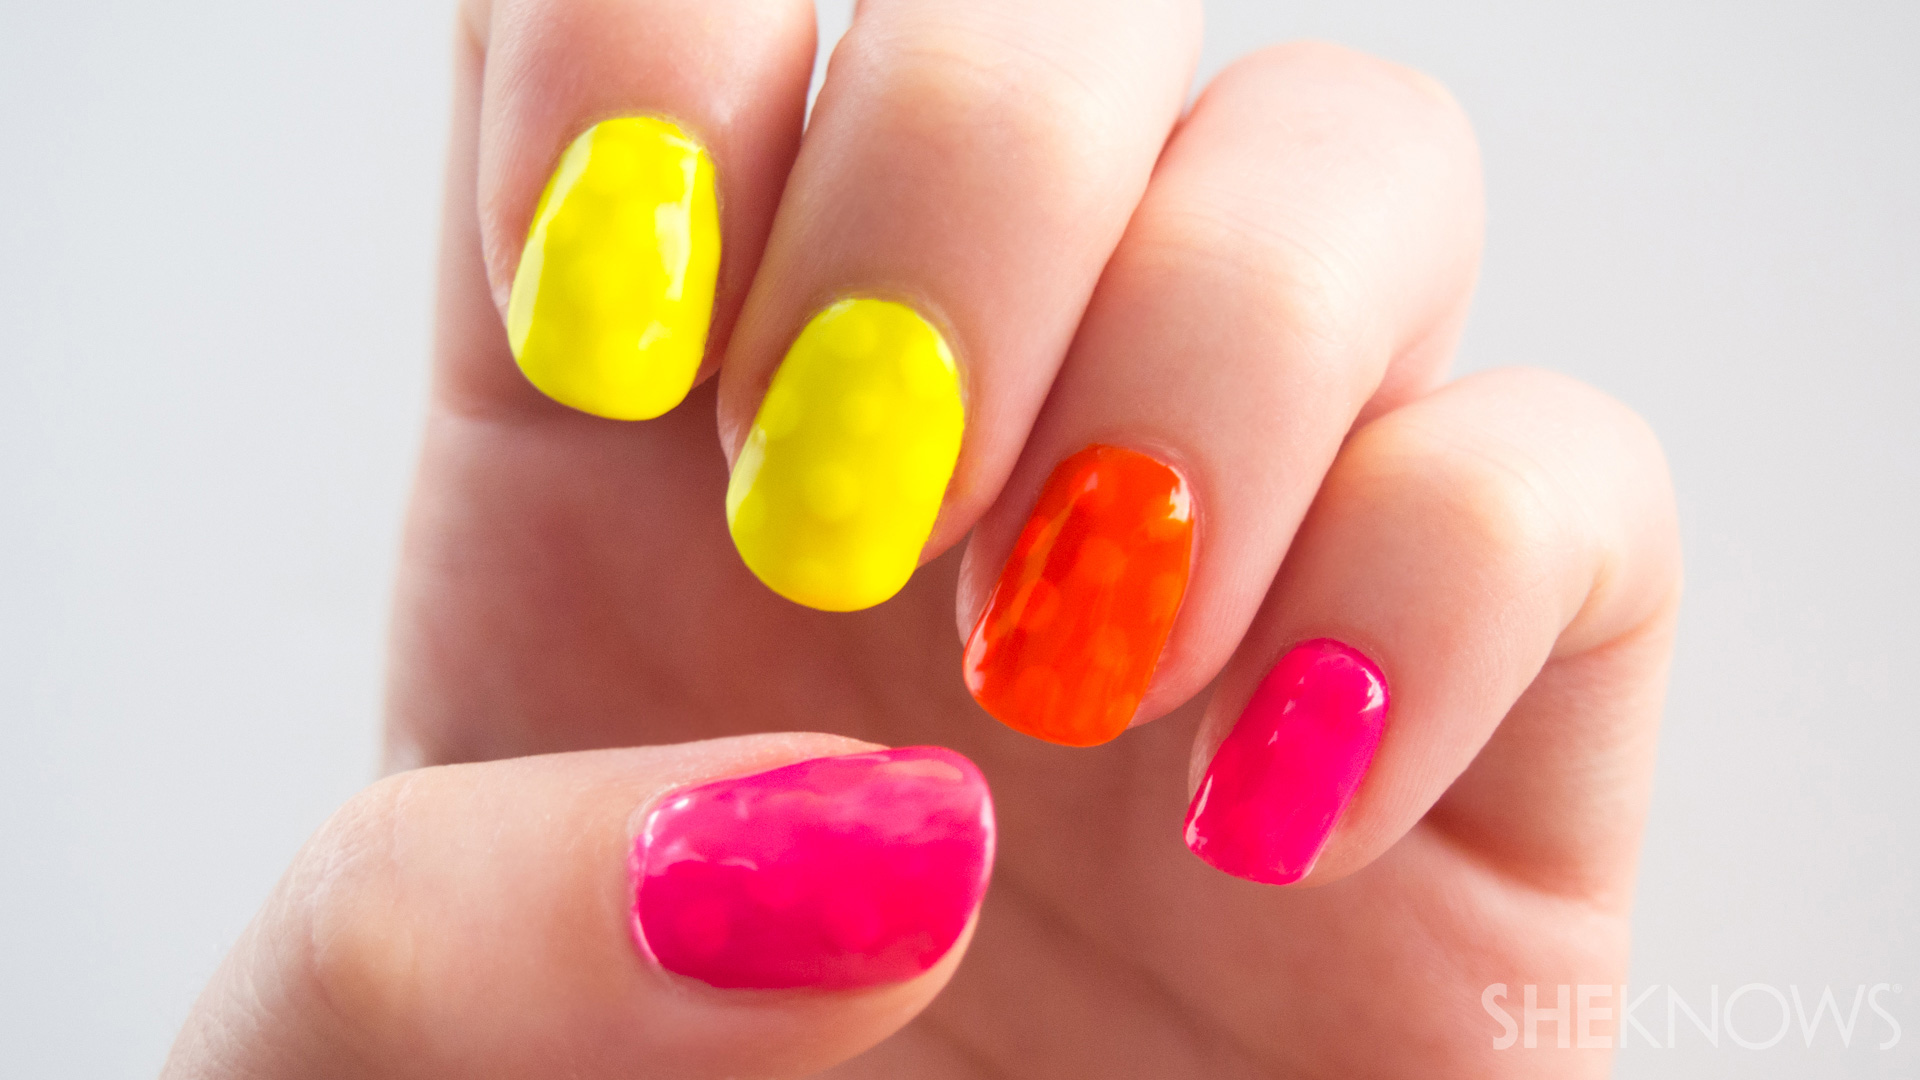 The secret to neon nail polish